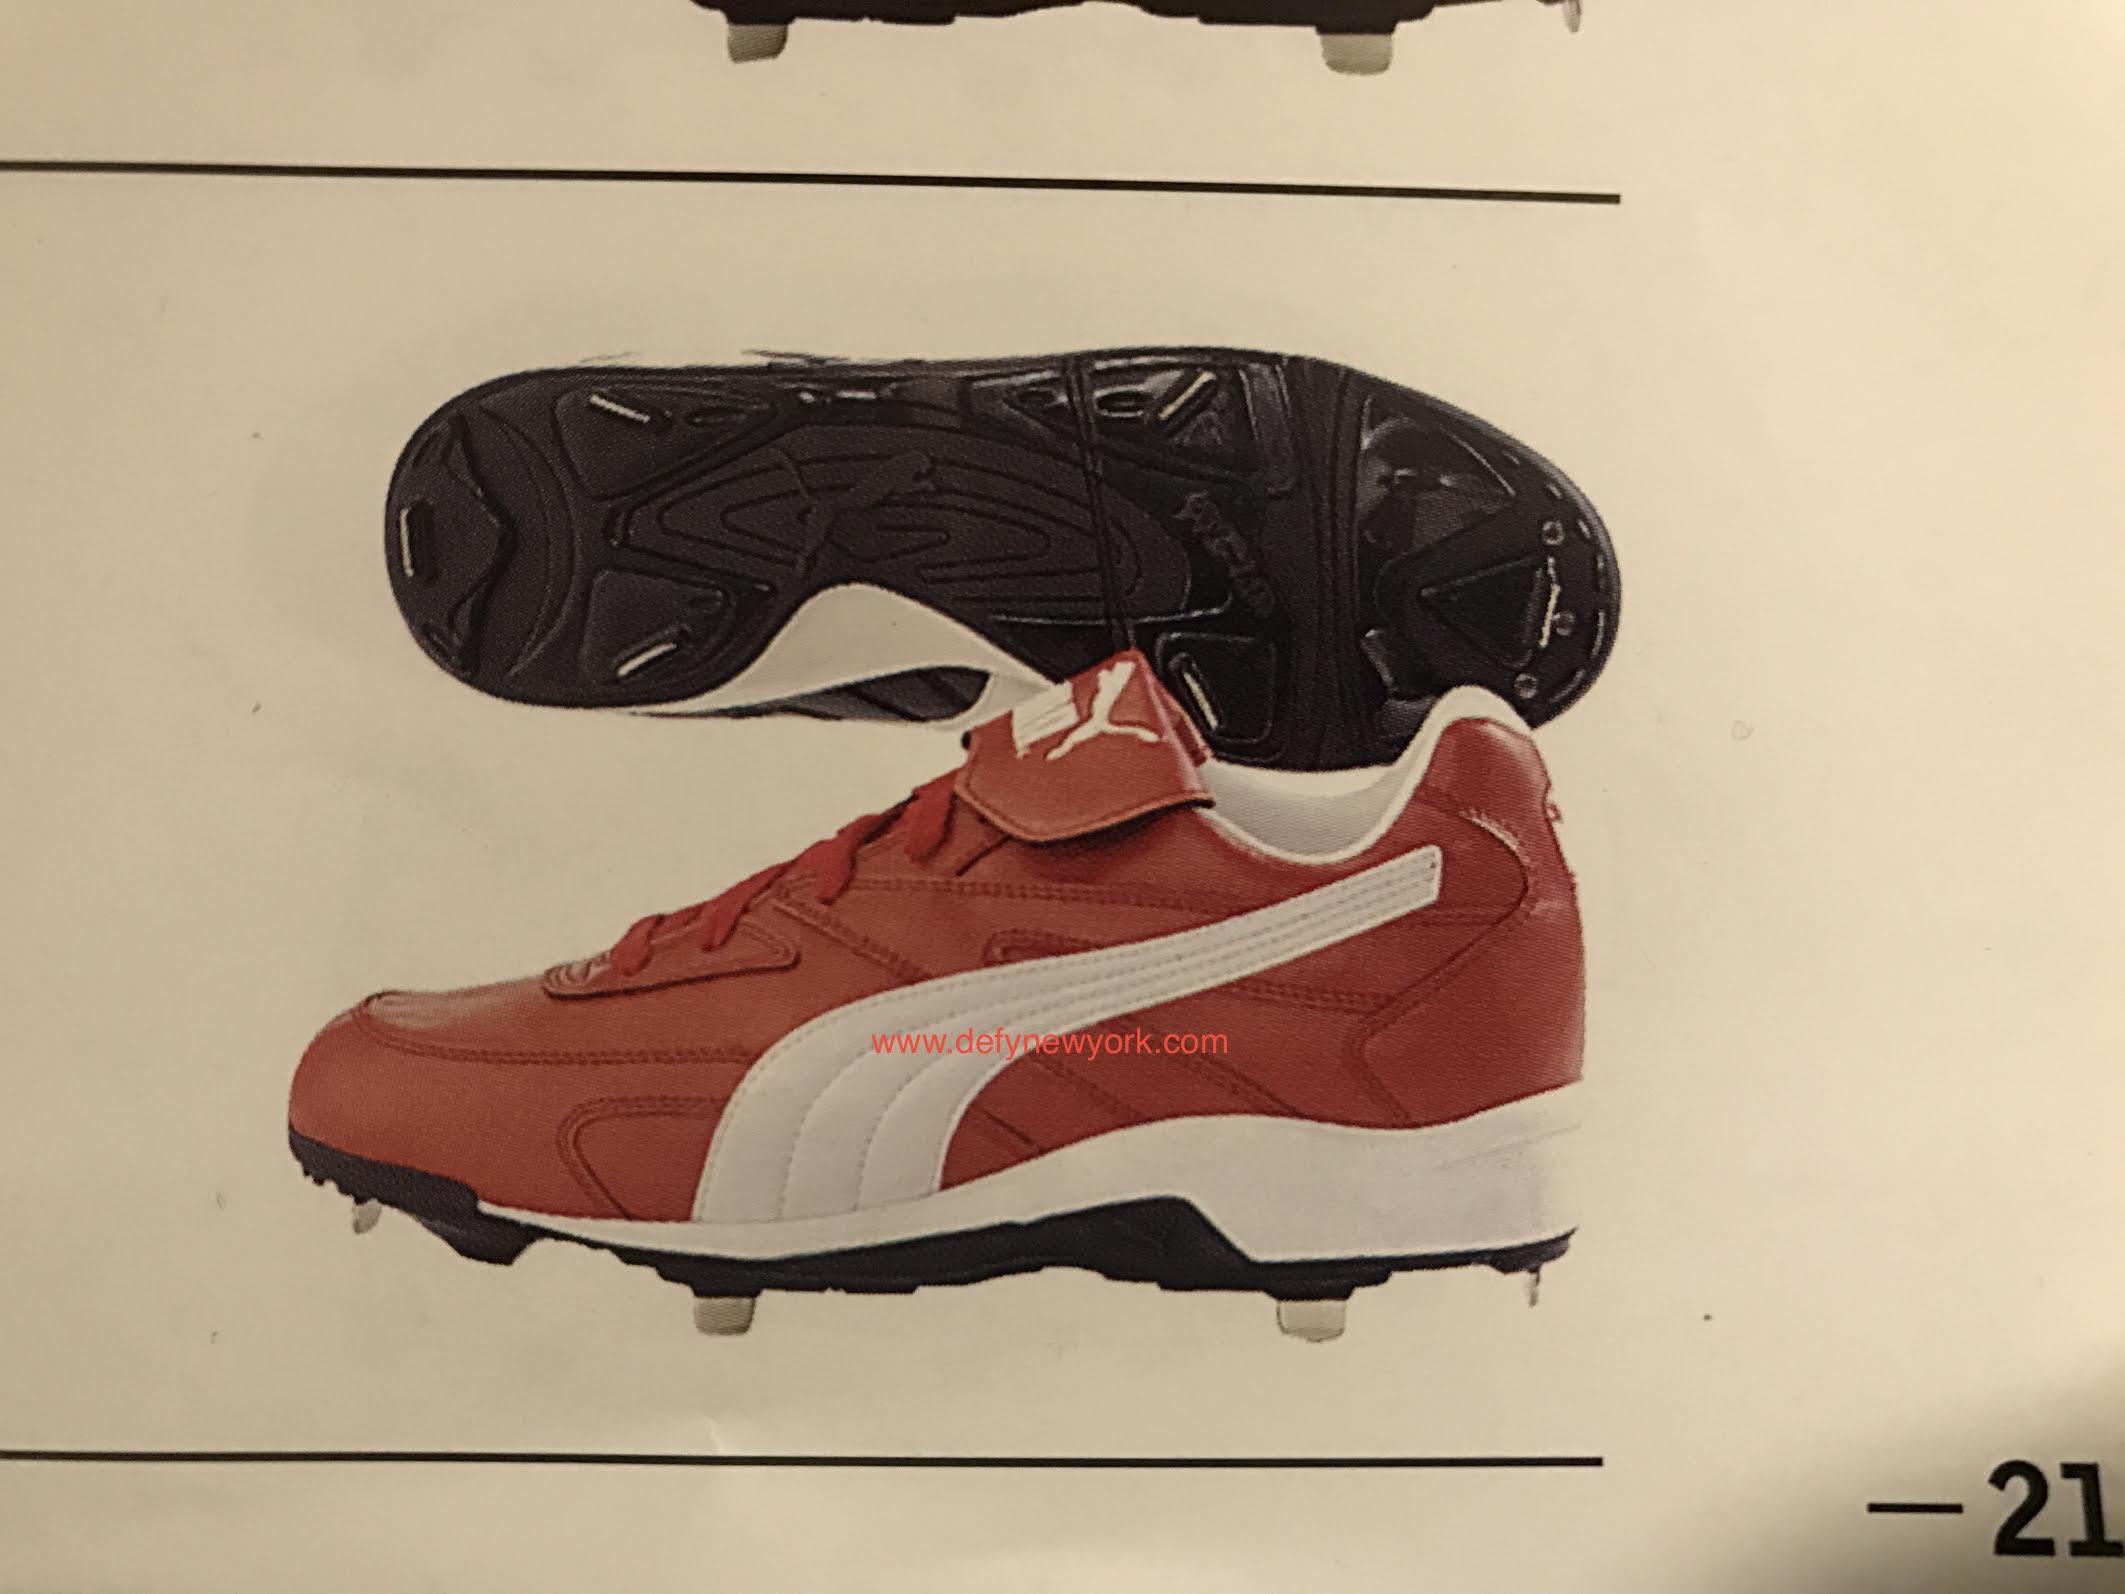 Puma Metal 3a Baseball Cleat 1999 Defy New York